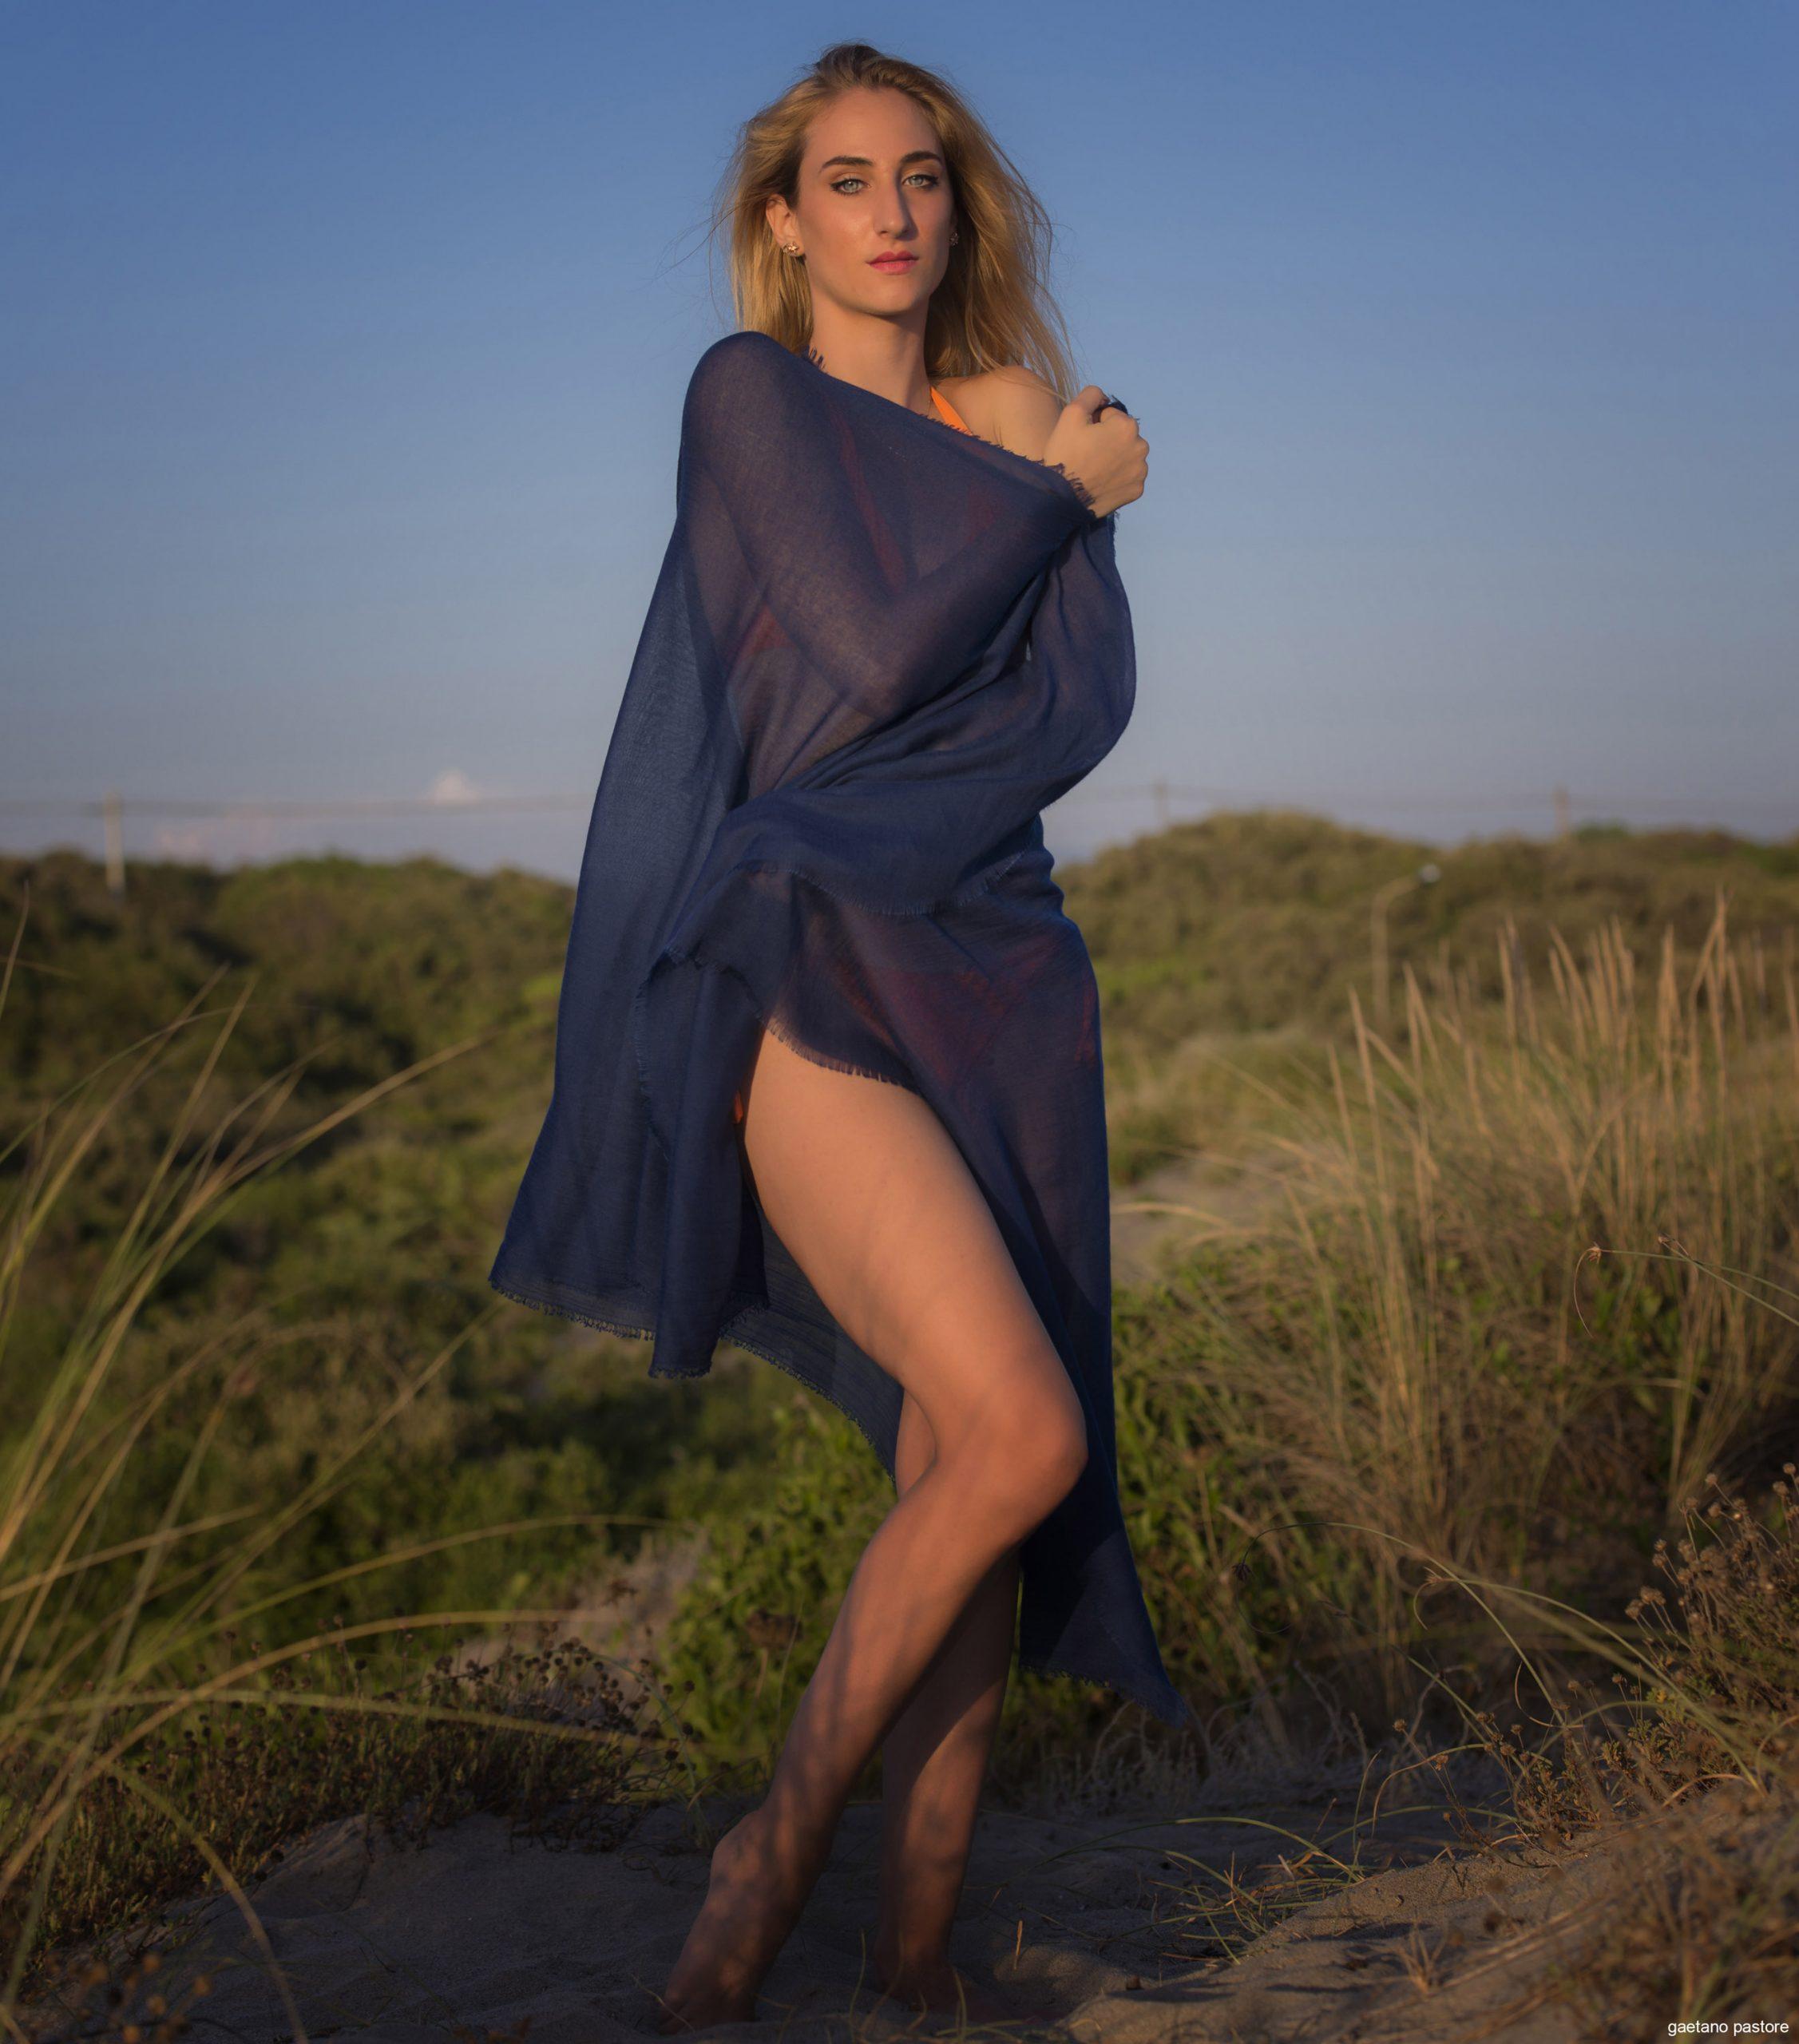 Categorie: Glamour; Photographer: GAETANO PASTORE; Model: MICHELA VICTORIA CAGNIN; Location: Ostia, RM, Italia